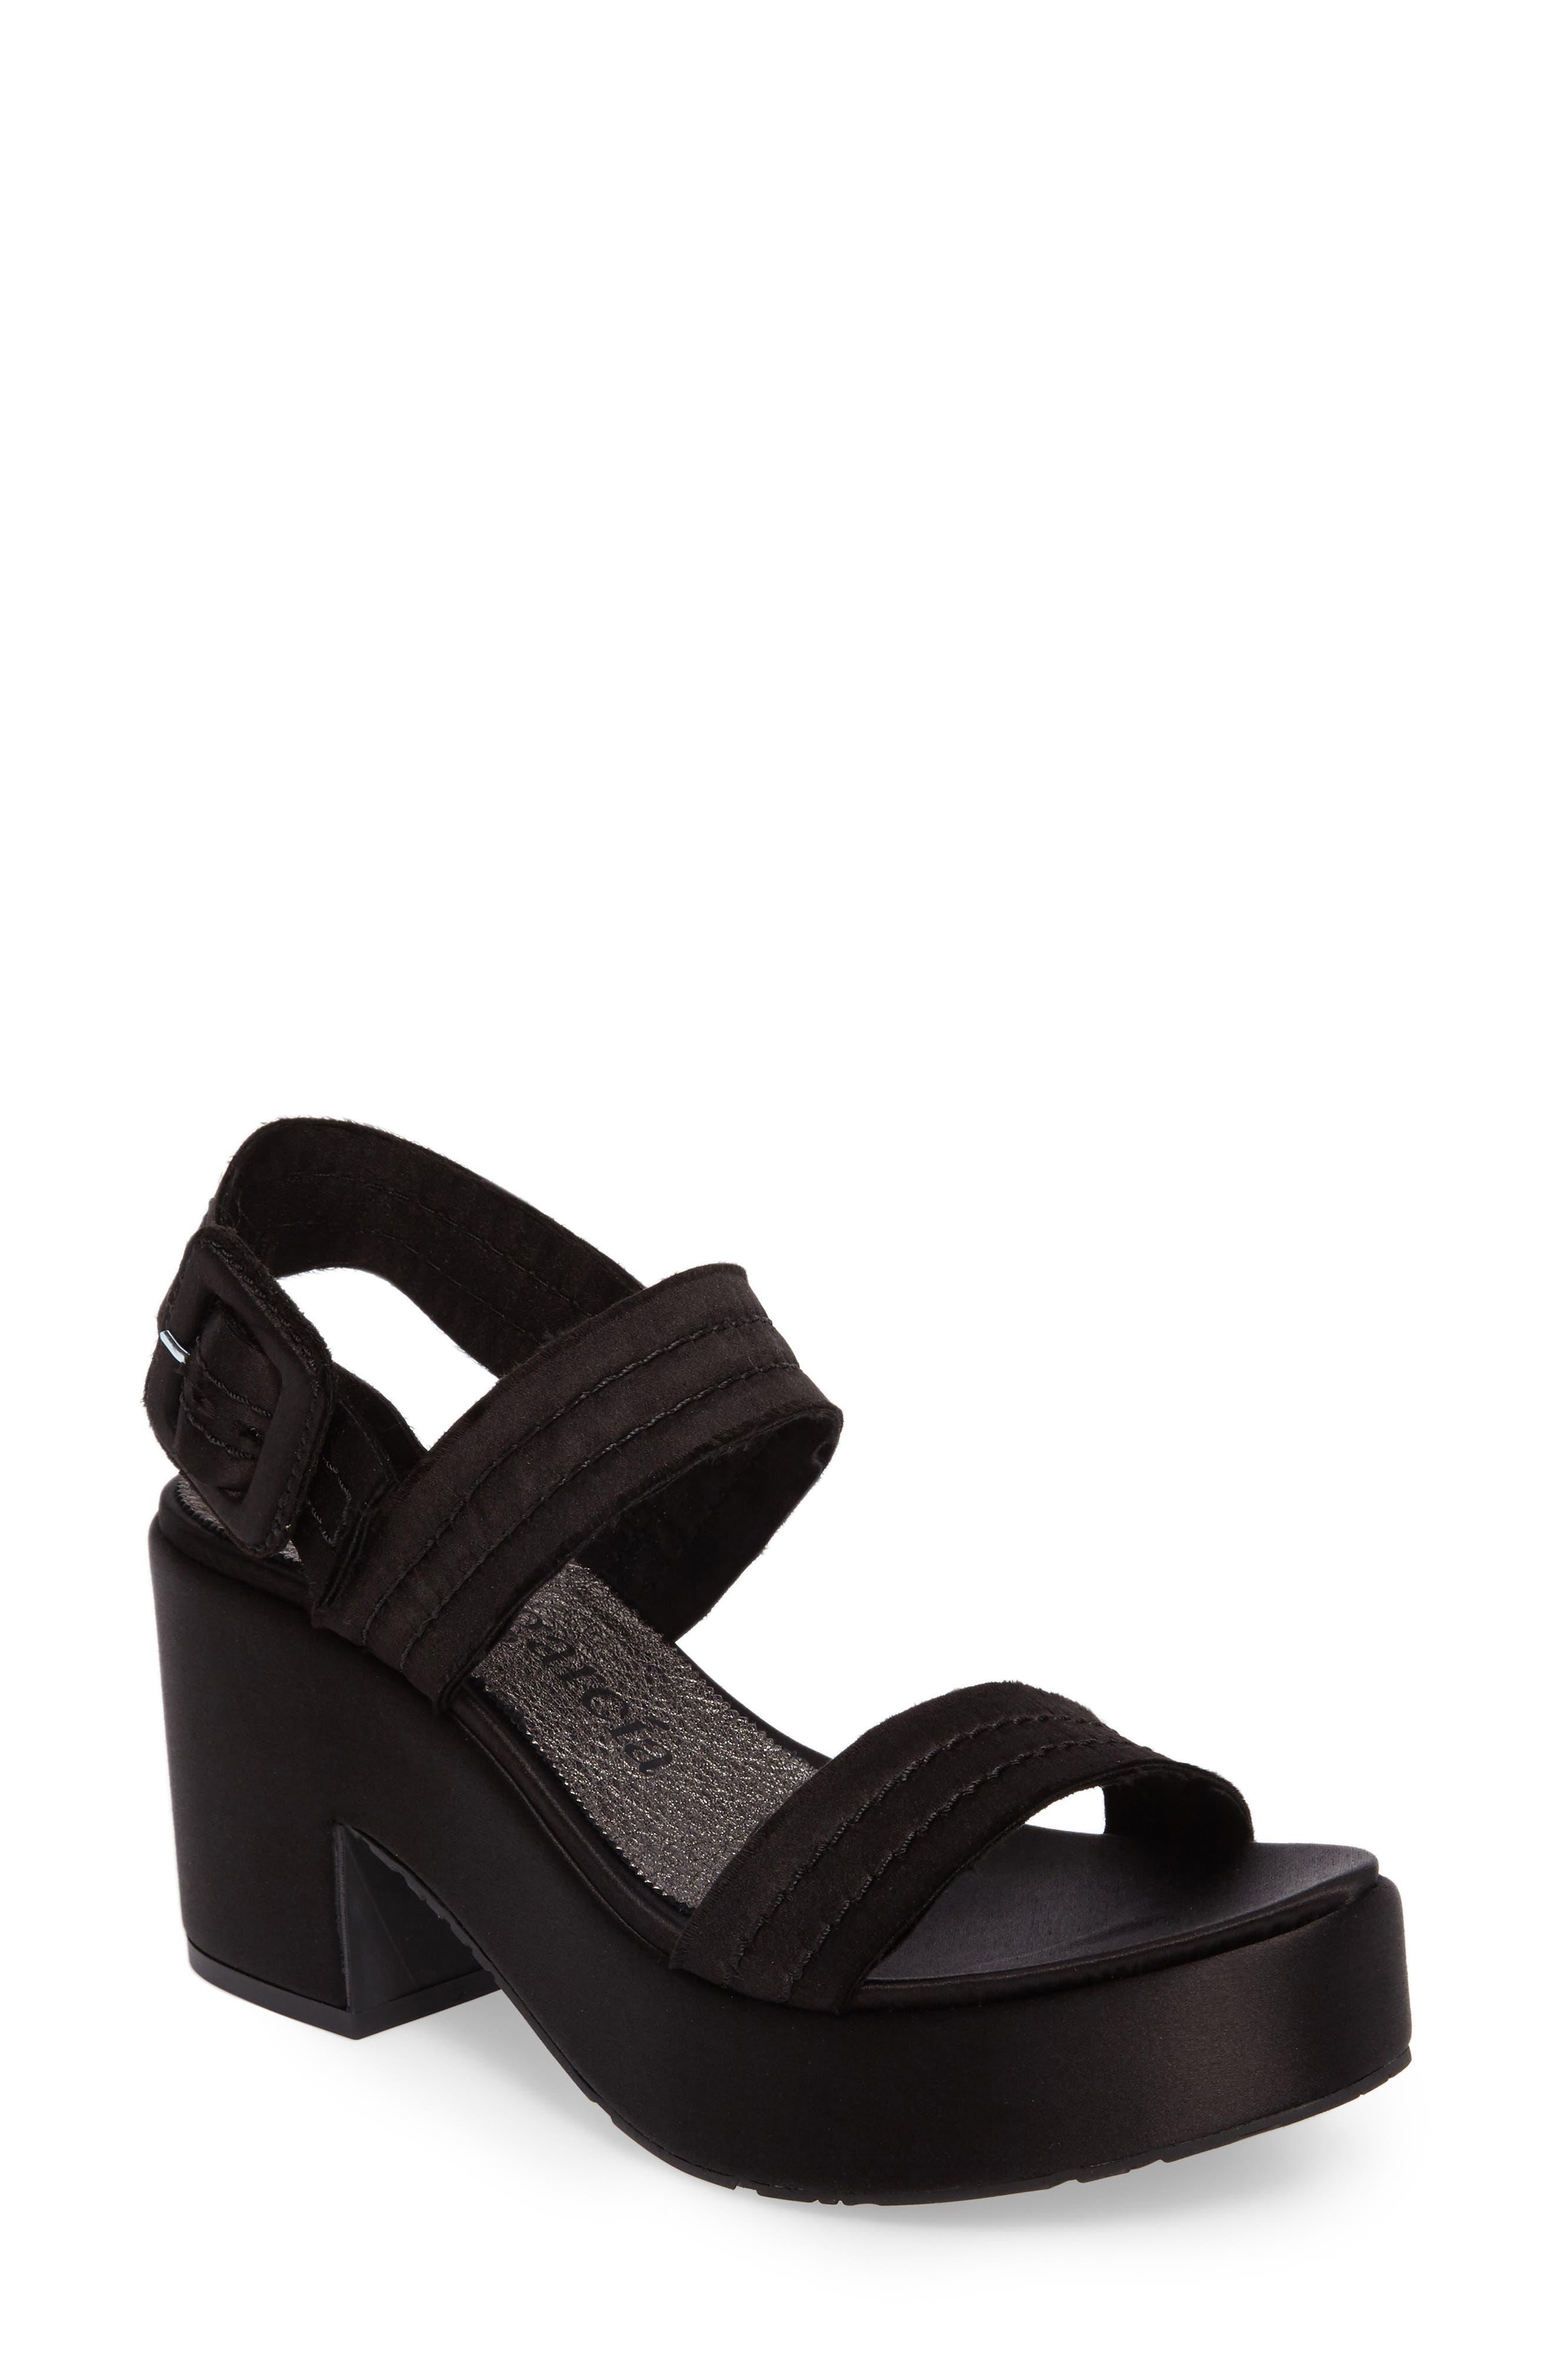 Decima Platform Sandal,                         Main,                         color, 001